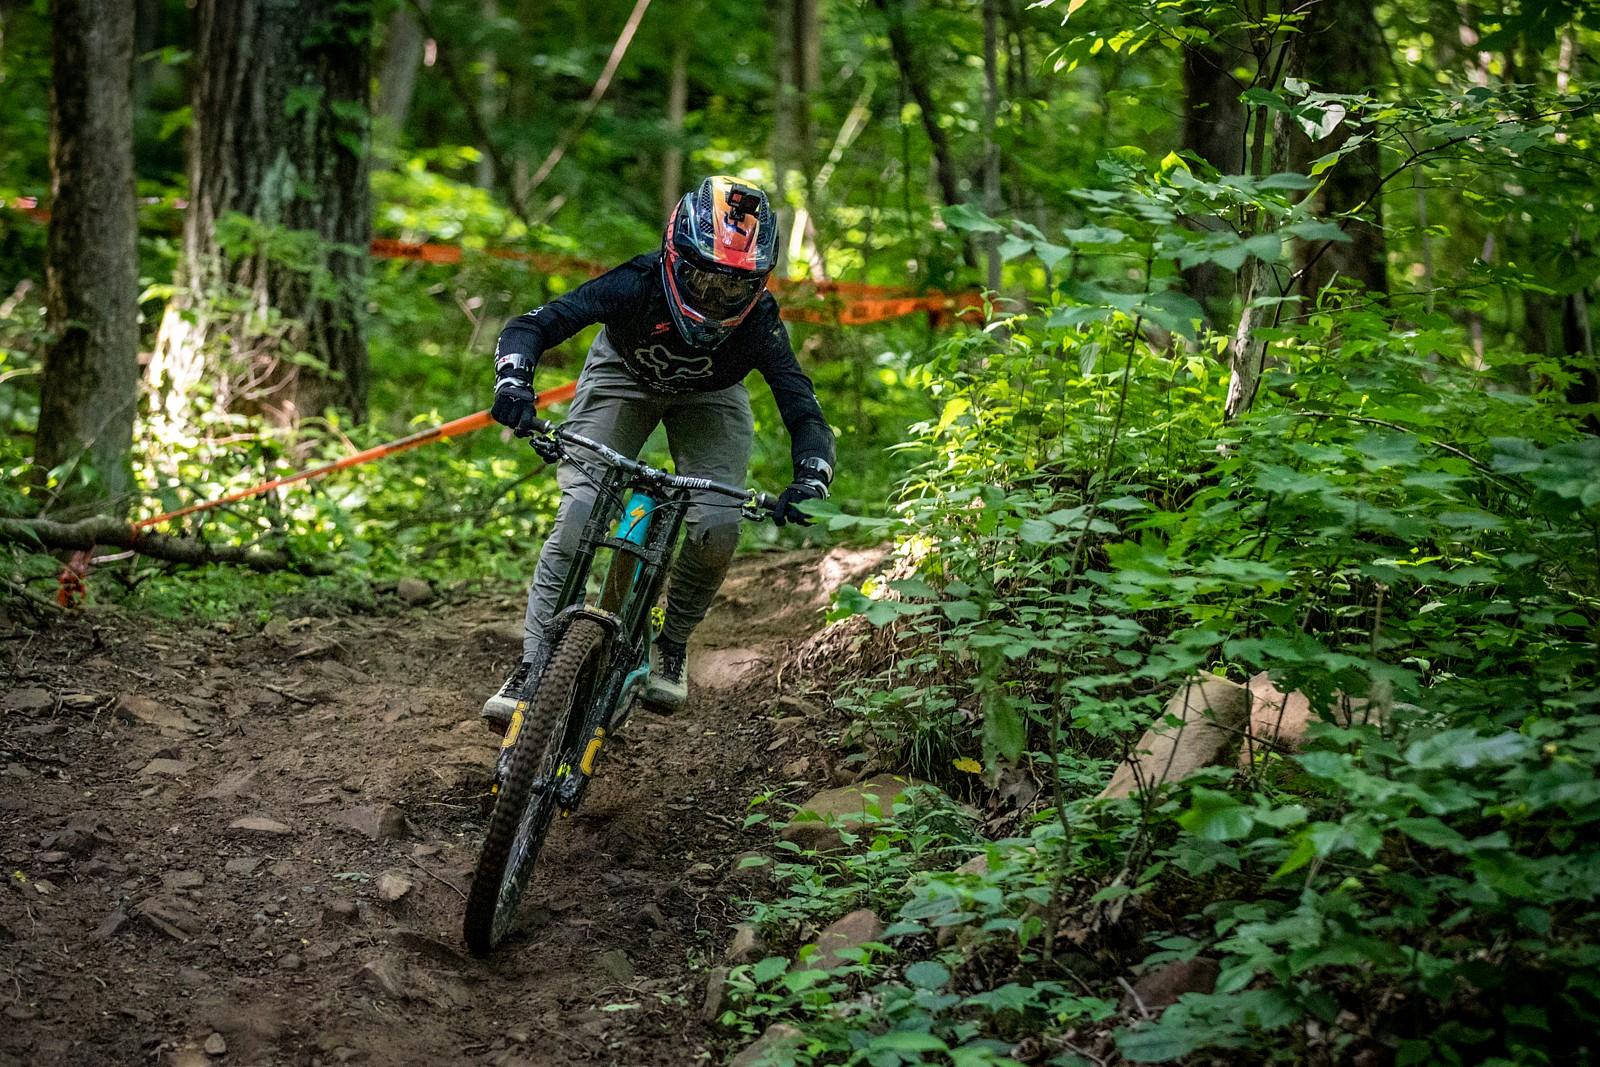 Chris Grice - JackRice - Mountain Biking Pictures - Vital MTB